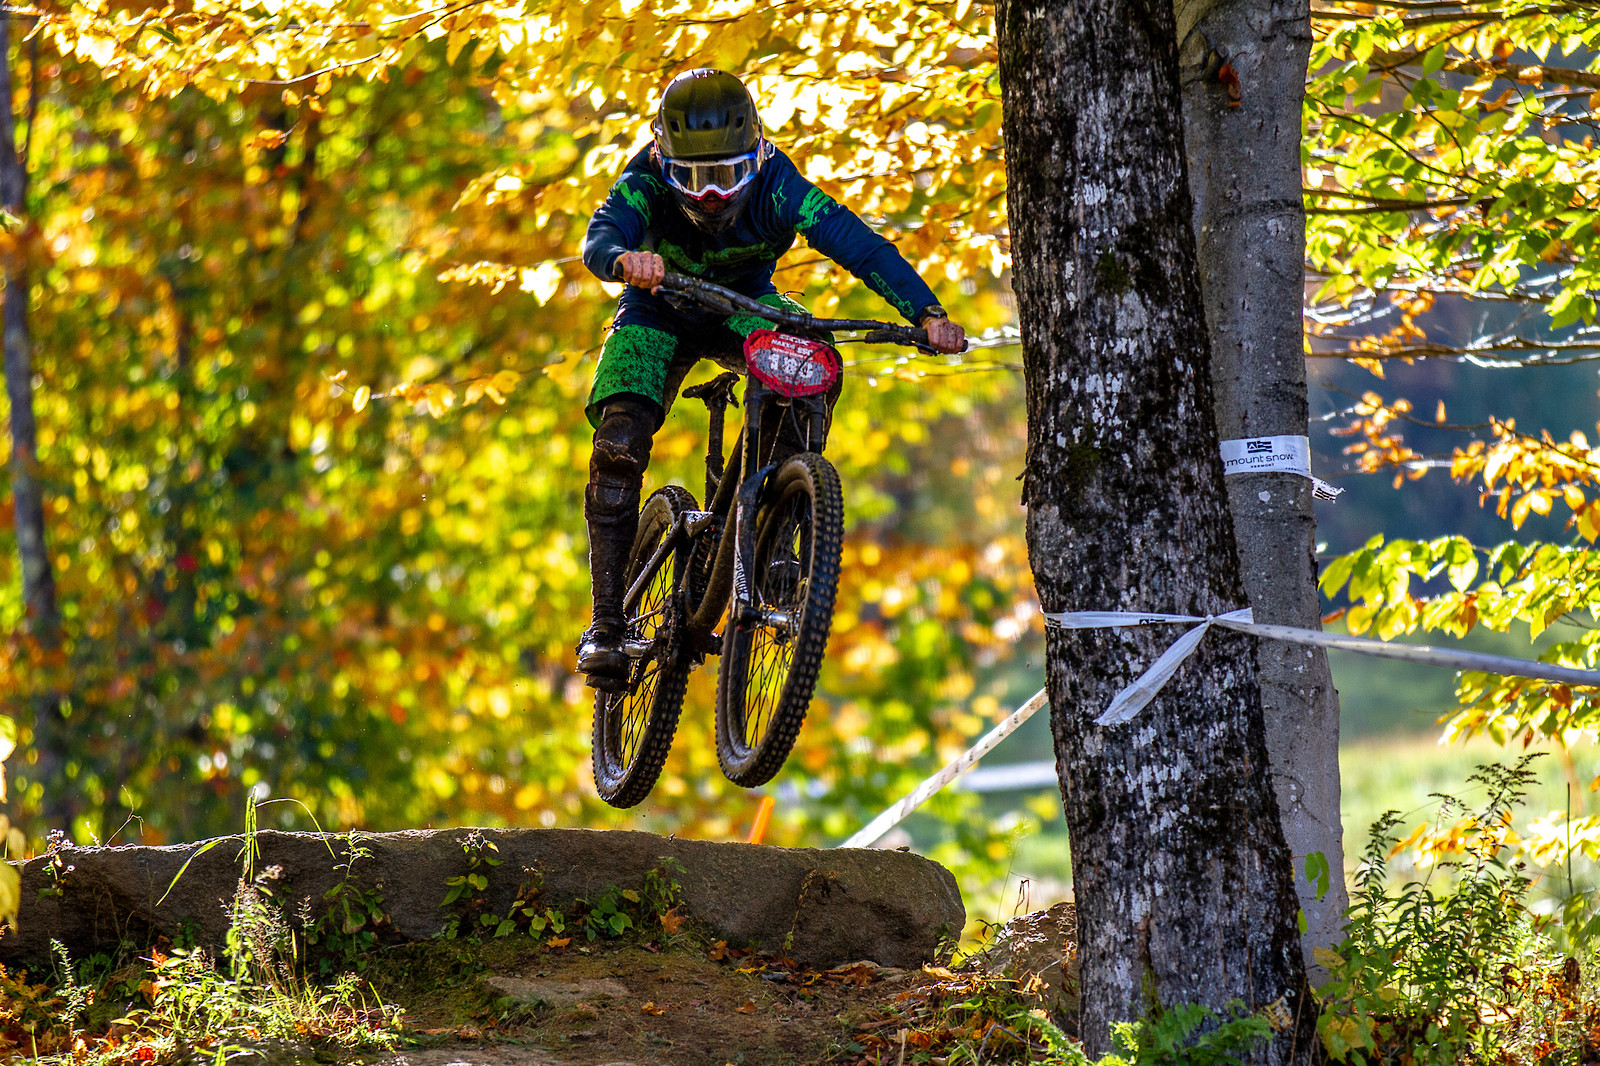 Lucas Rey-Sierro - JackRice - Mountain Biking Pictures - Vital MTB